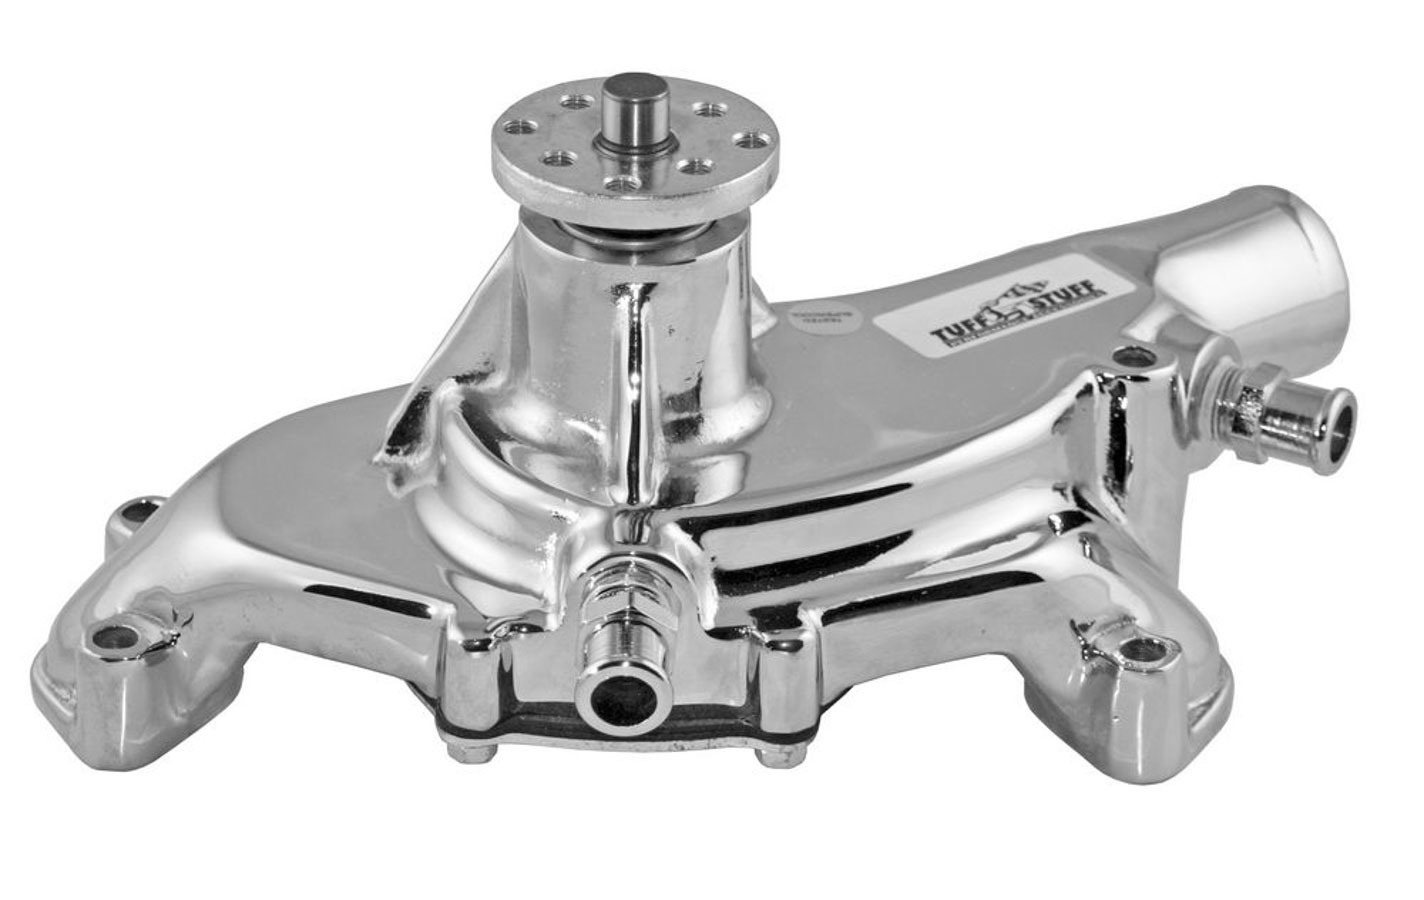 Tuff-Stuff 1495ABREV Water Pump, Mechanical, Platinum Series, High Volume, Reverse Rotation, Short Design, Aluminum, Polished, Big Block Chevy, Each